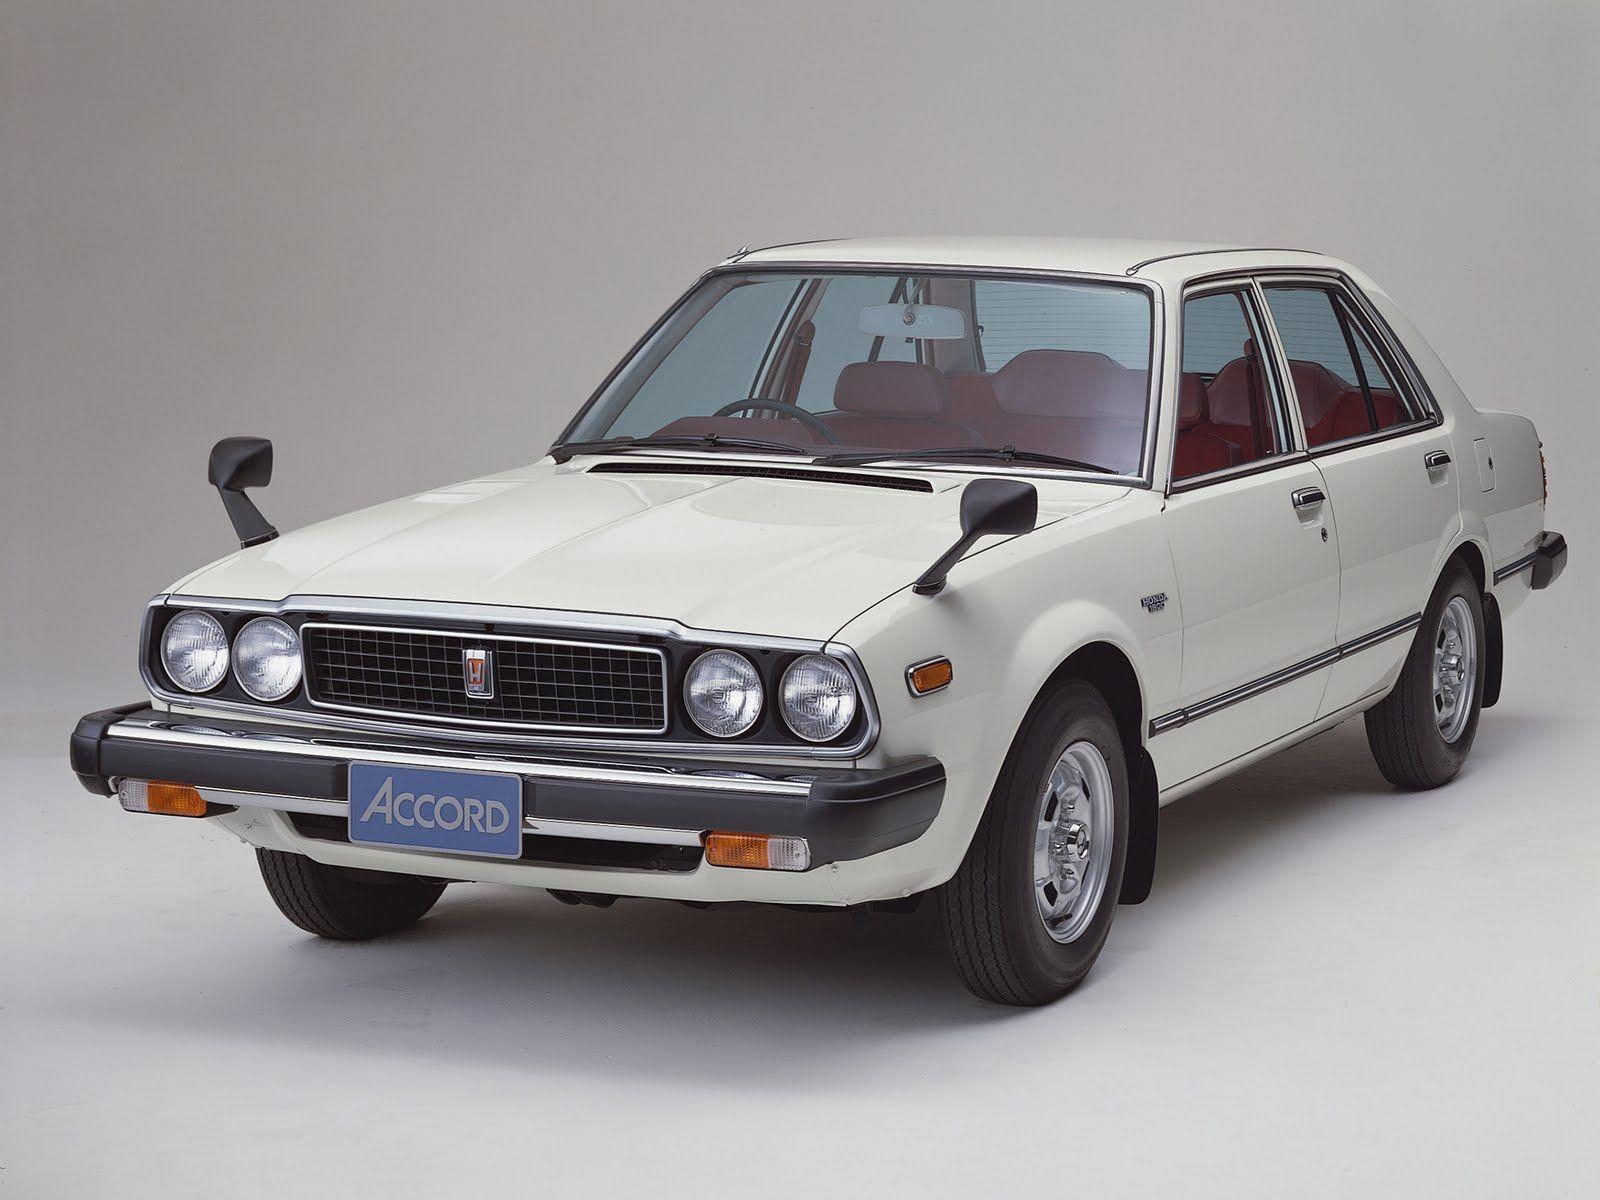 1982 honda accord h b jdm classic pinterest honda accord honda and japanese cars